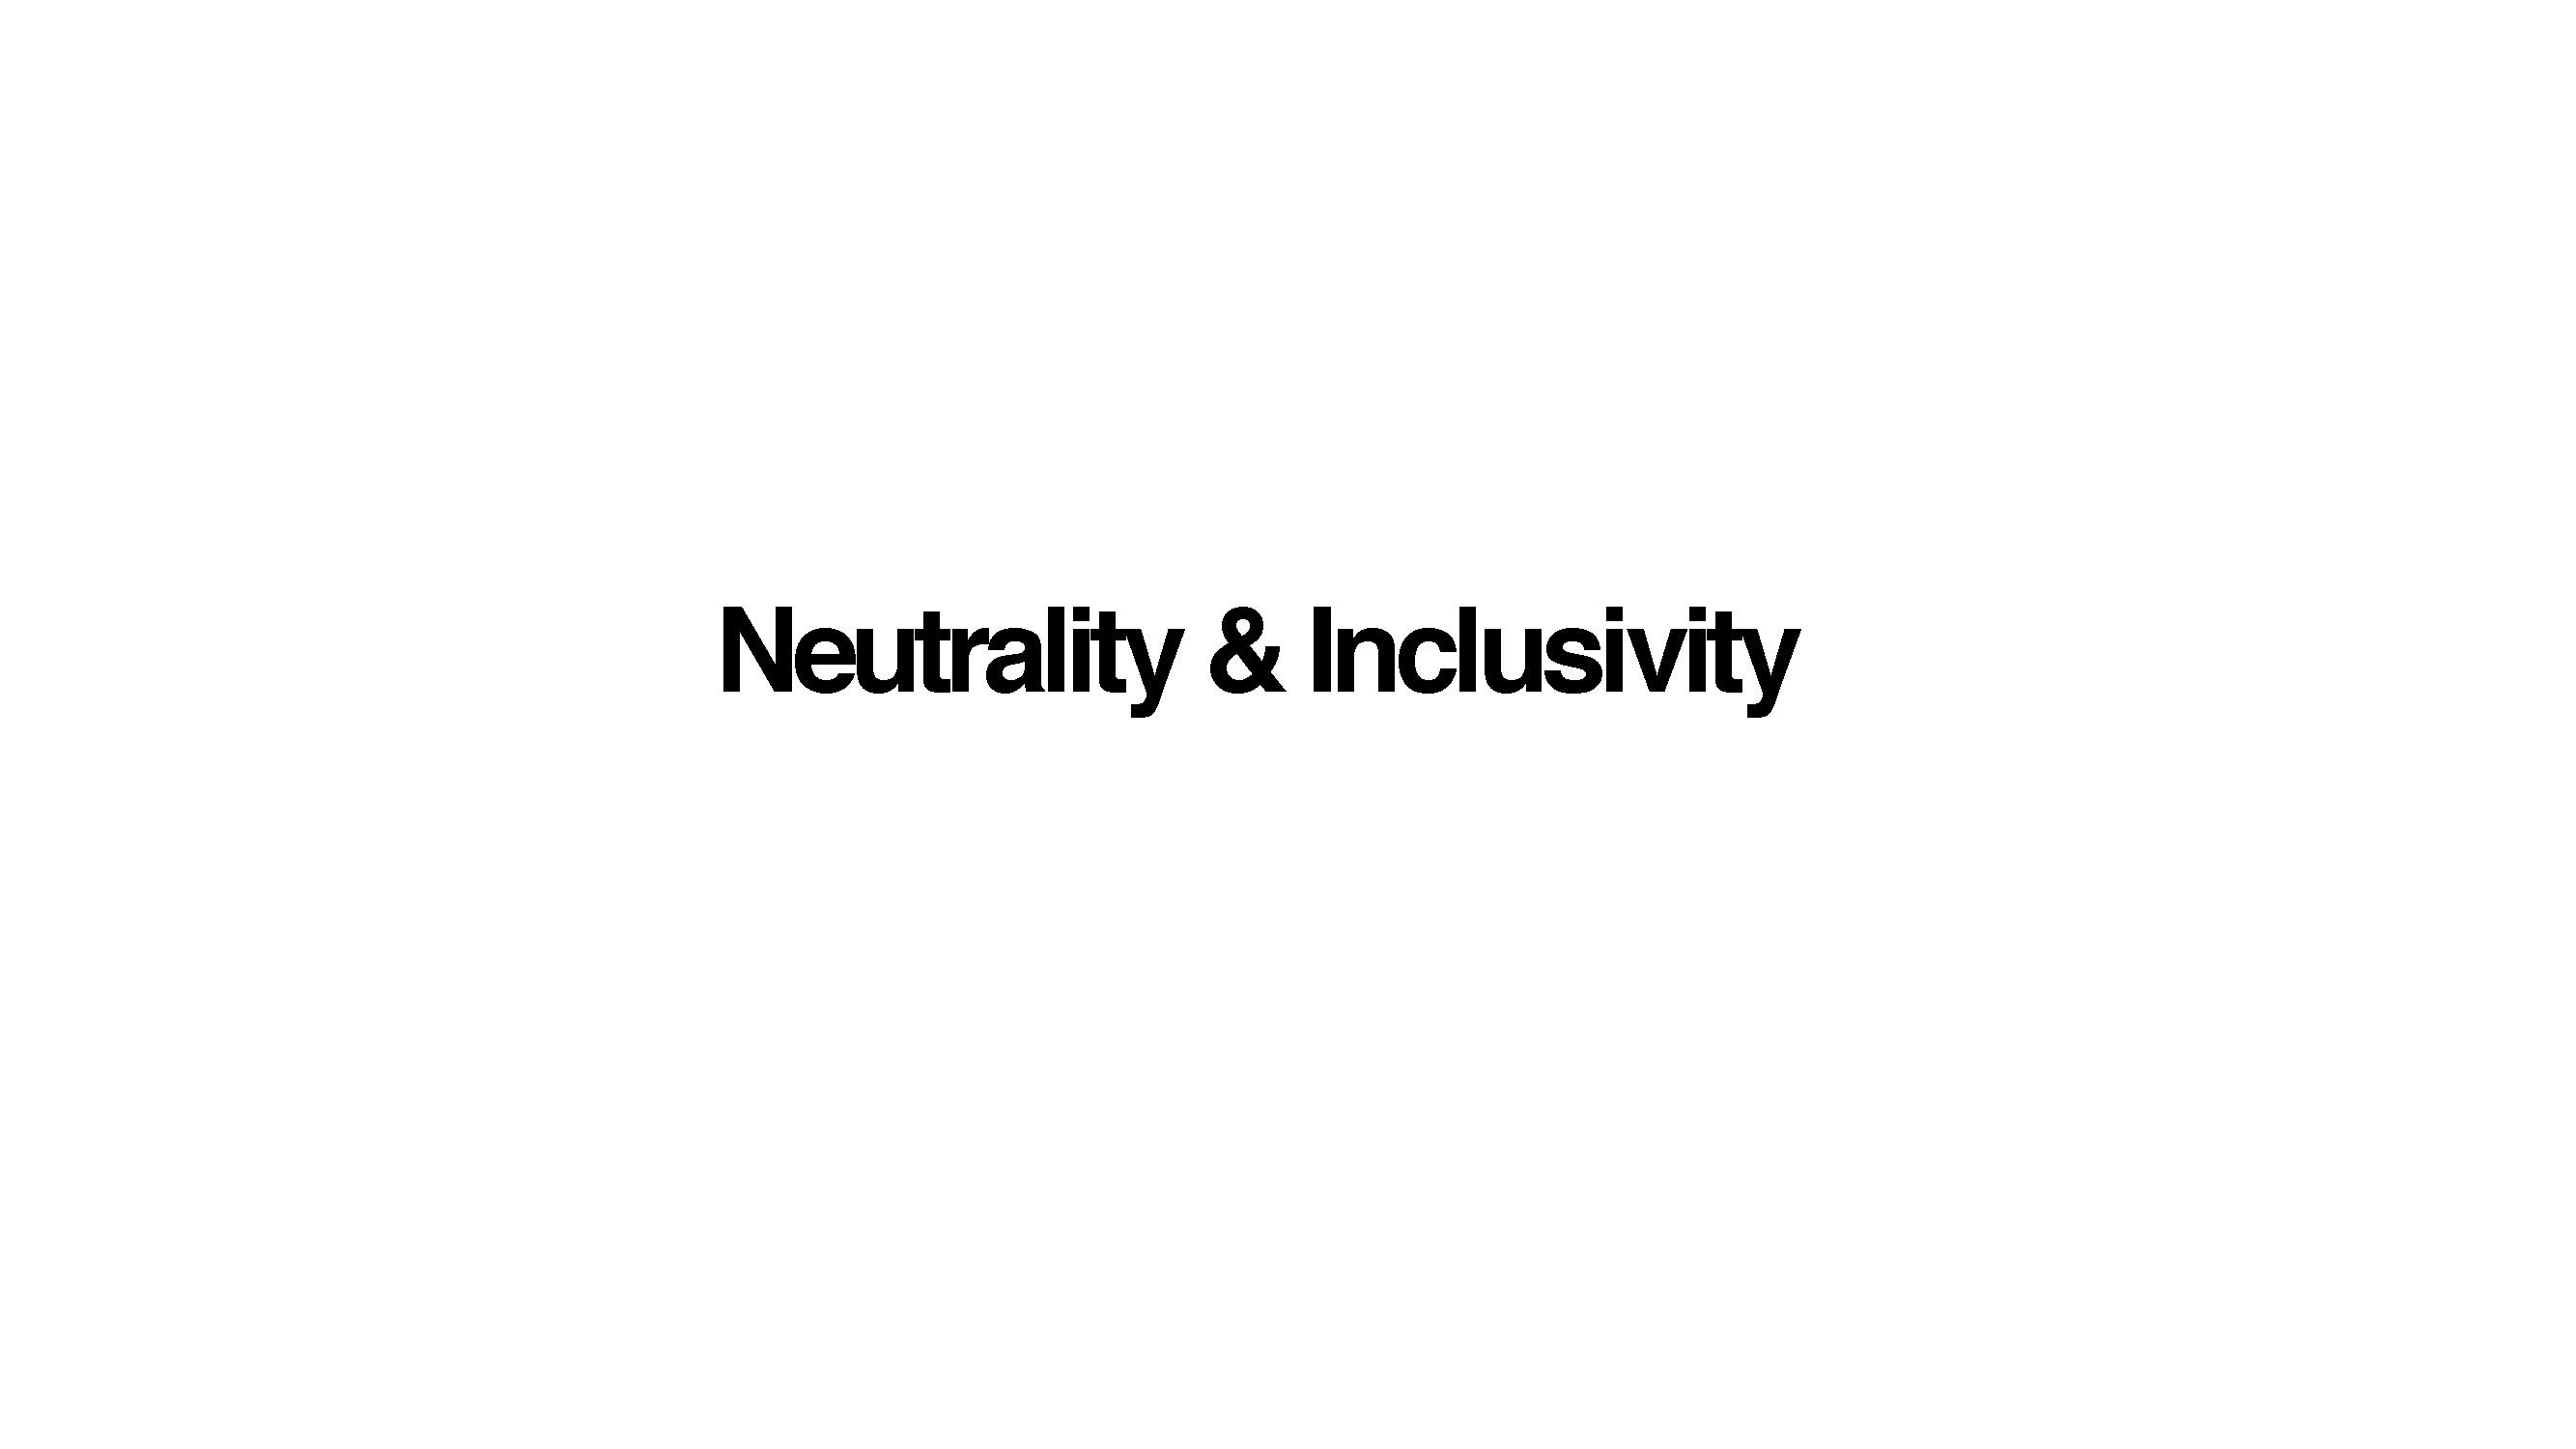 Neutrality & Inclusivity